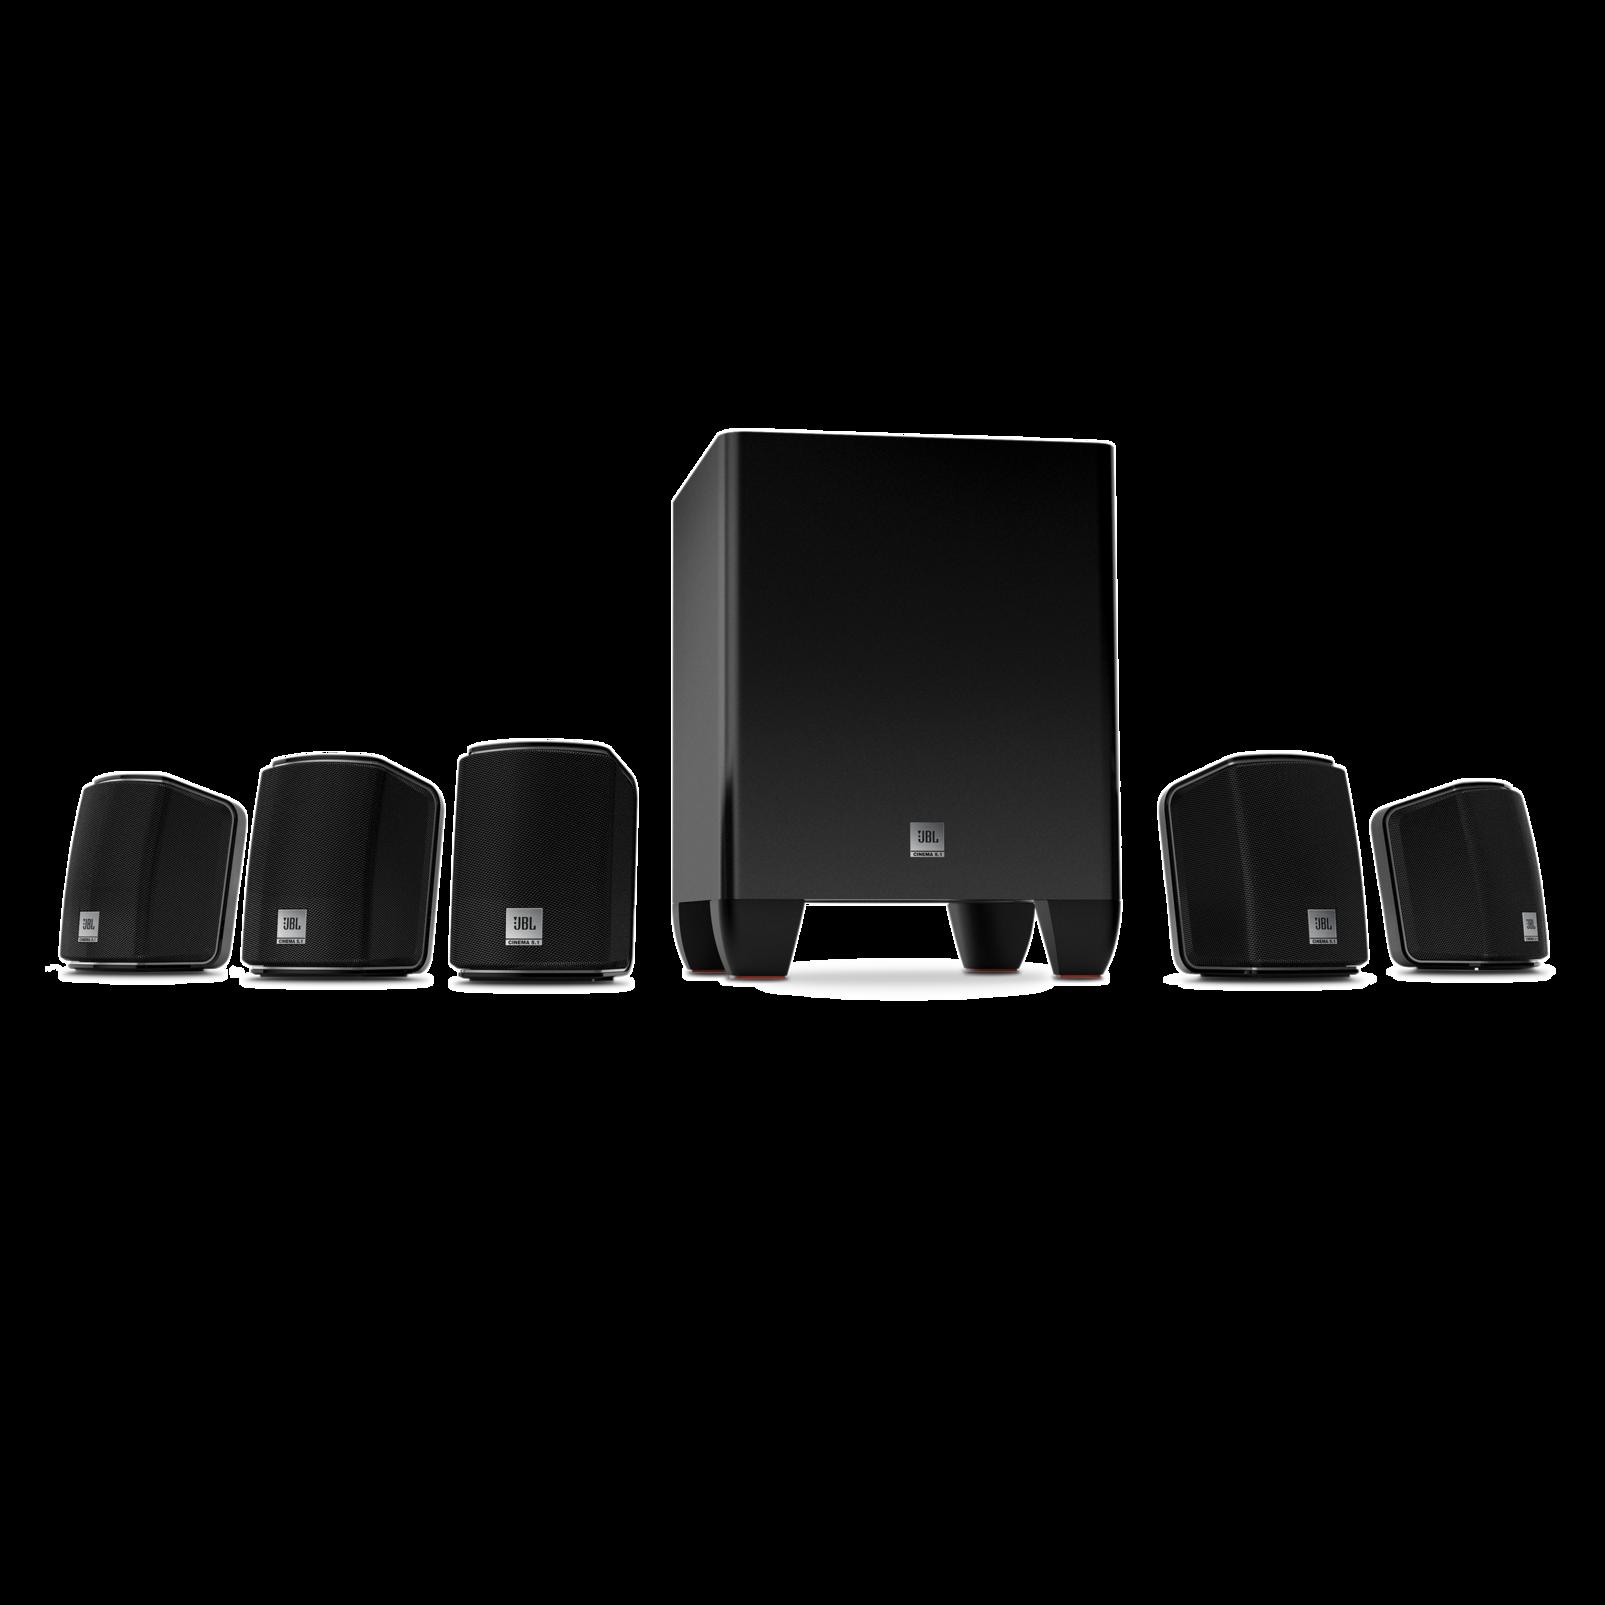 Jbl Cinema 510 51 Speaker System Wiring Diagram On Impedance Matching